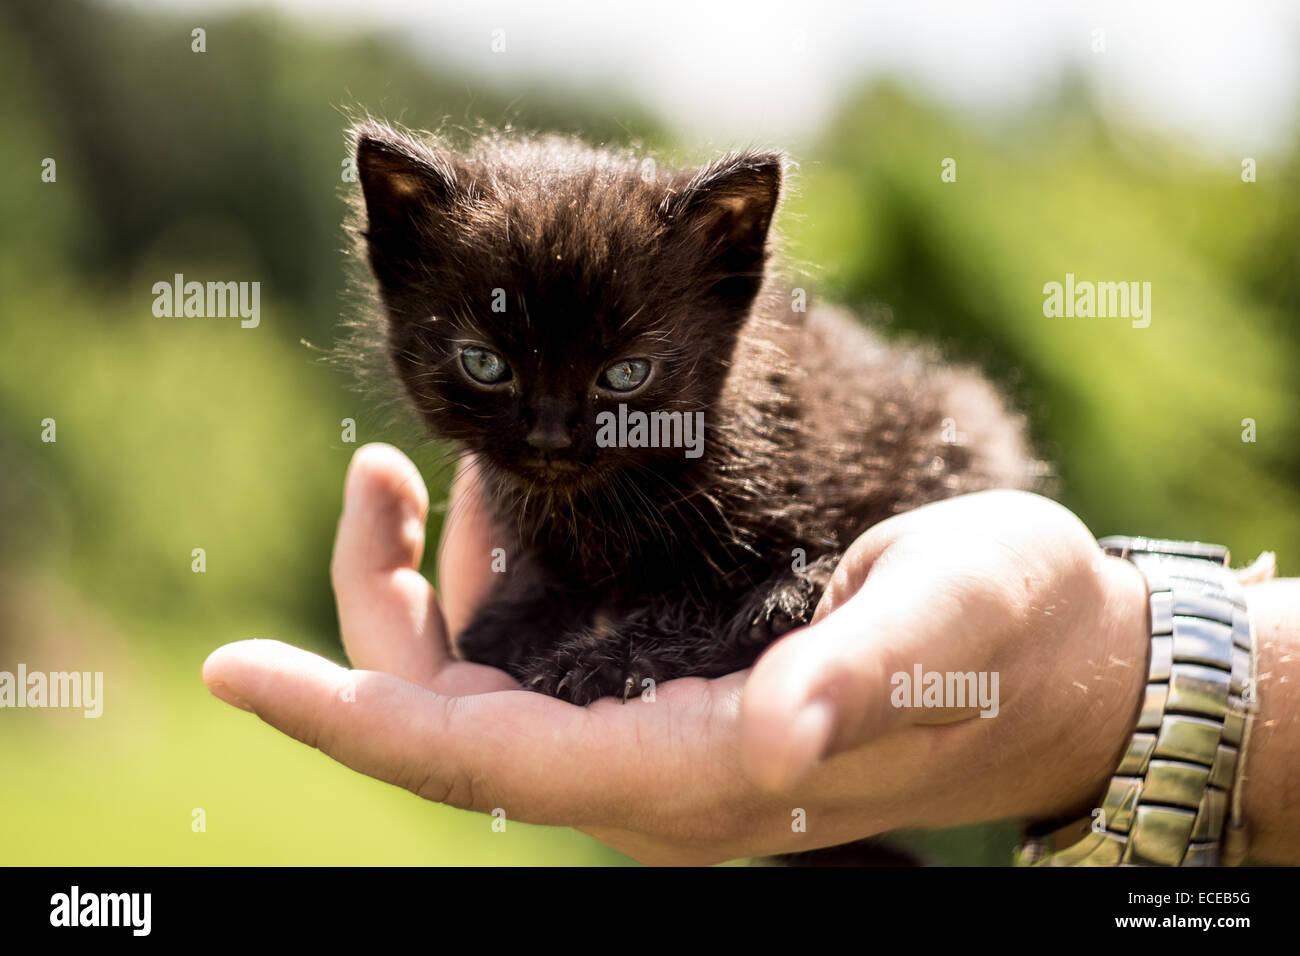 Kitty in backyard - Stock Image